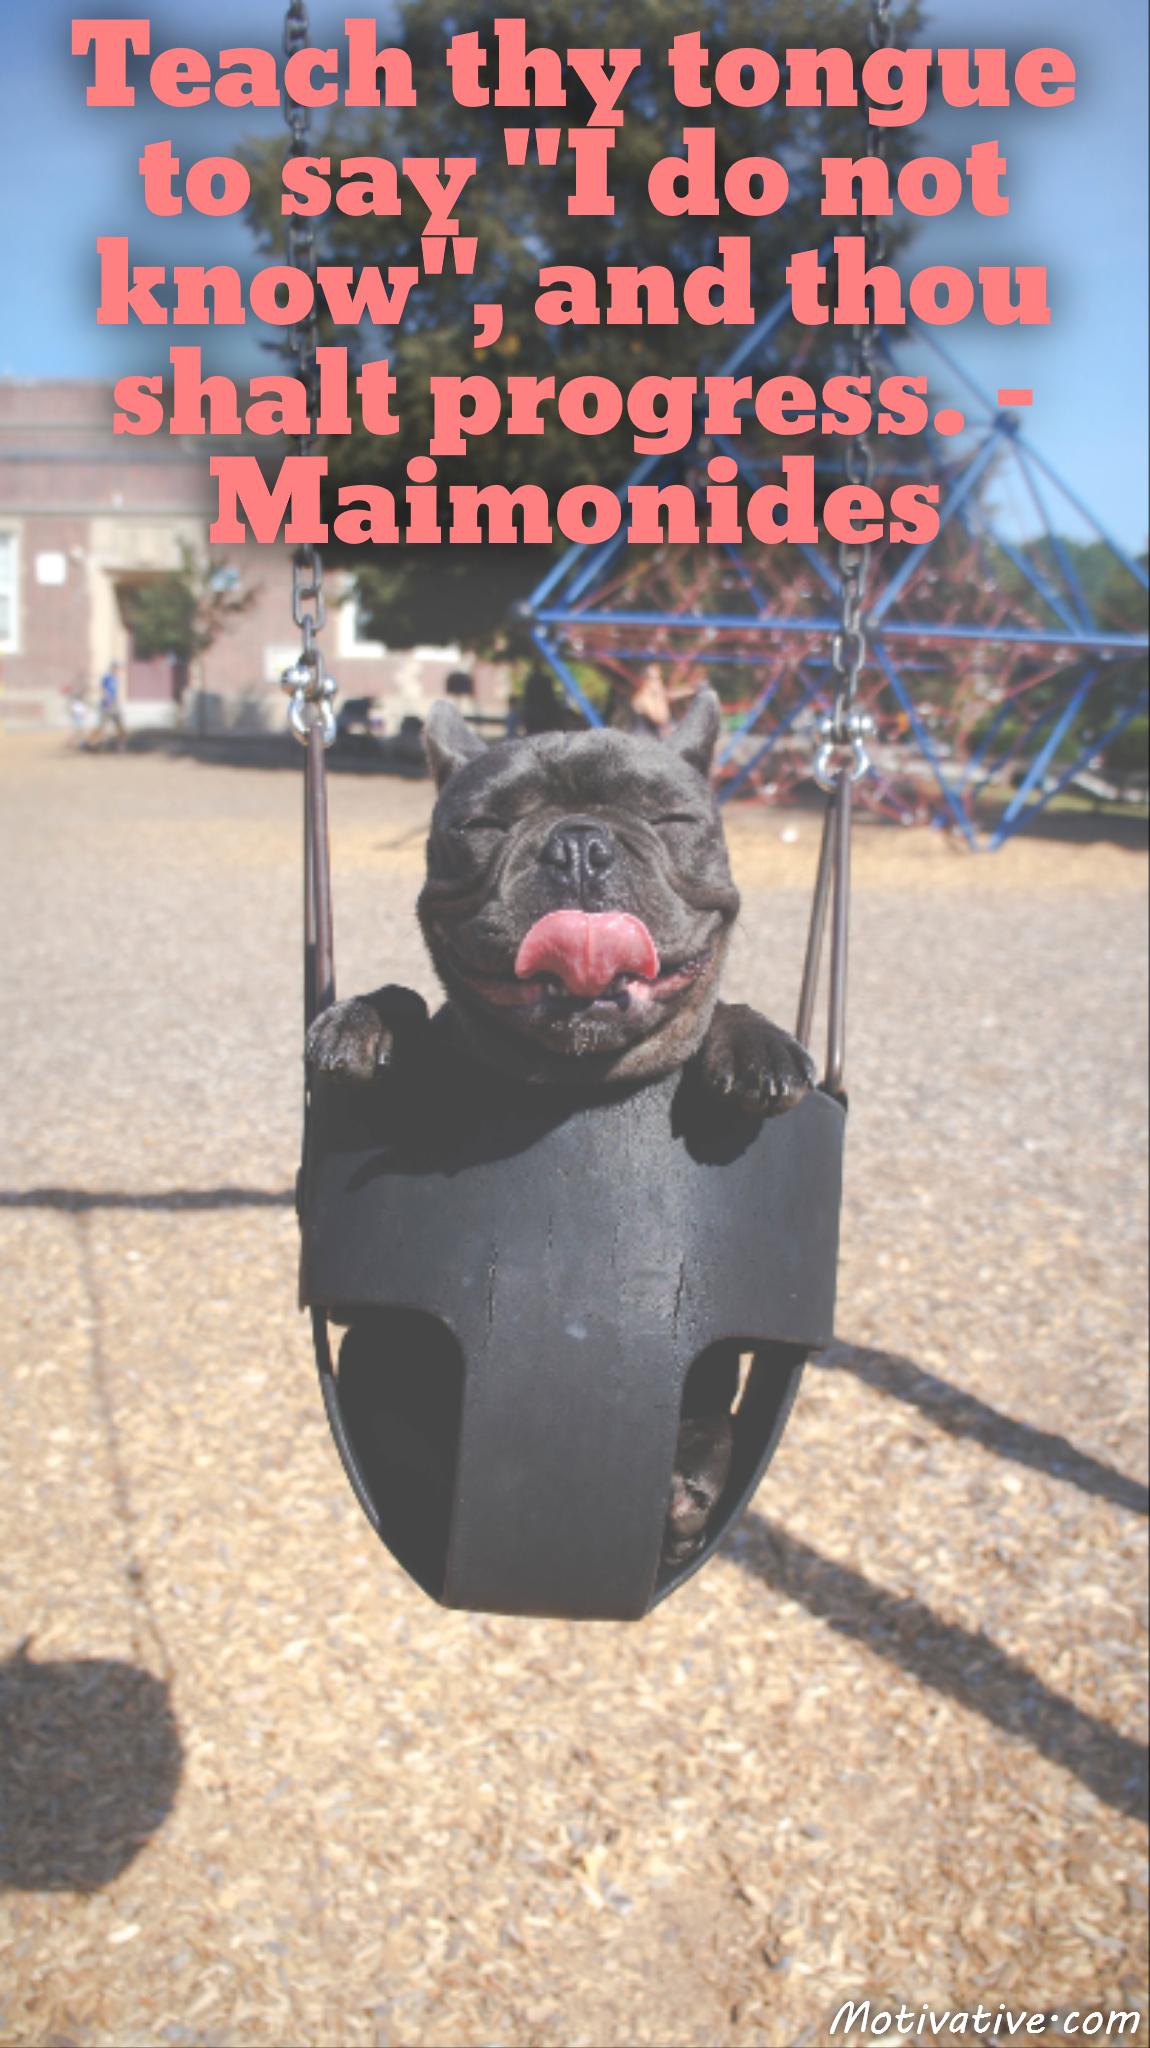 Teach thy tongue to say I do not know, and thou shalt progress. – Maimonides